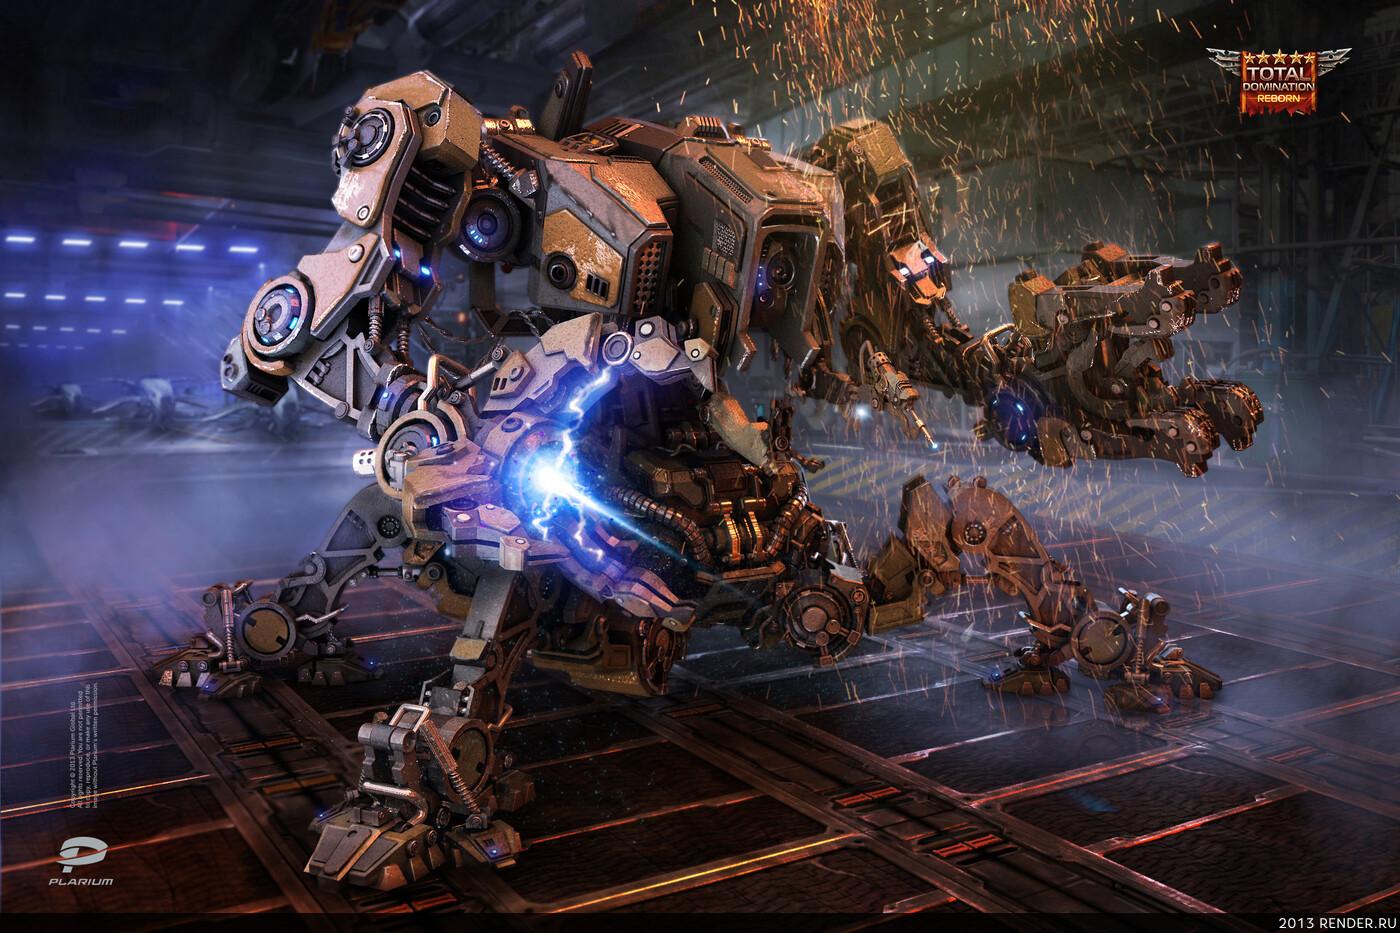 digital 3d, game art, military, Plarium, robot, sci-fi